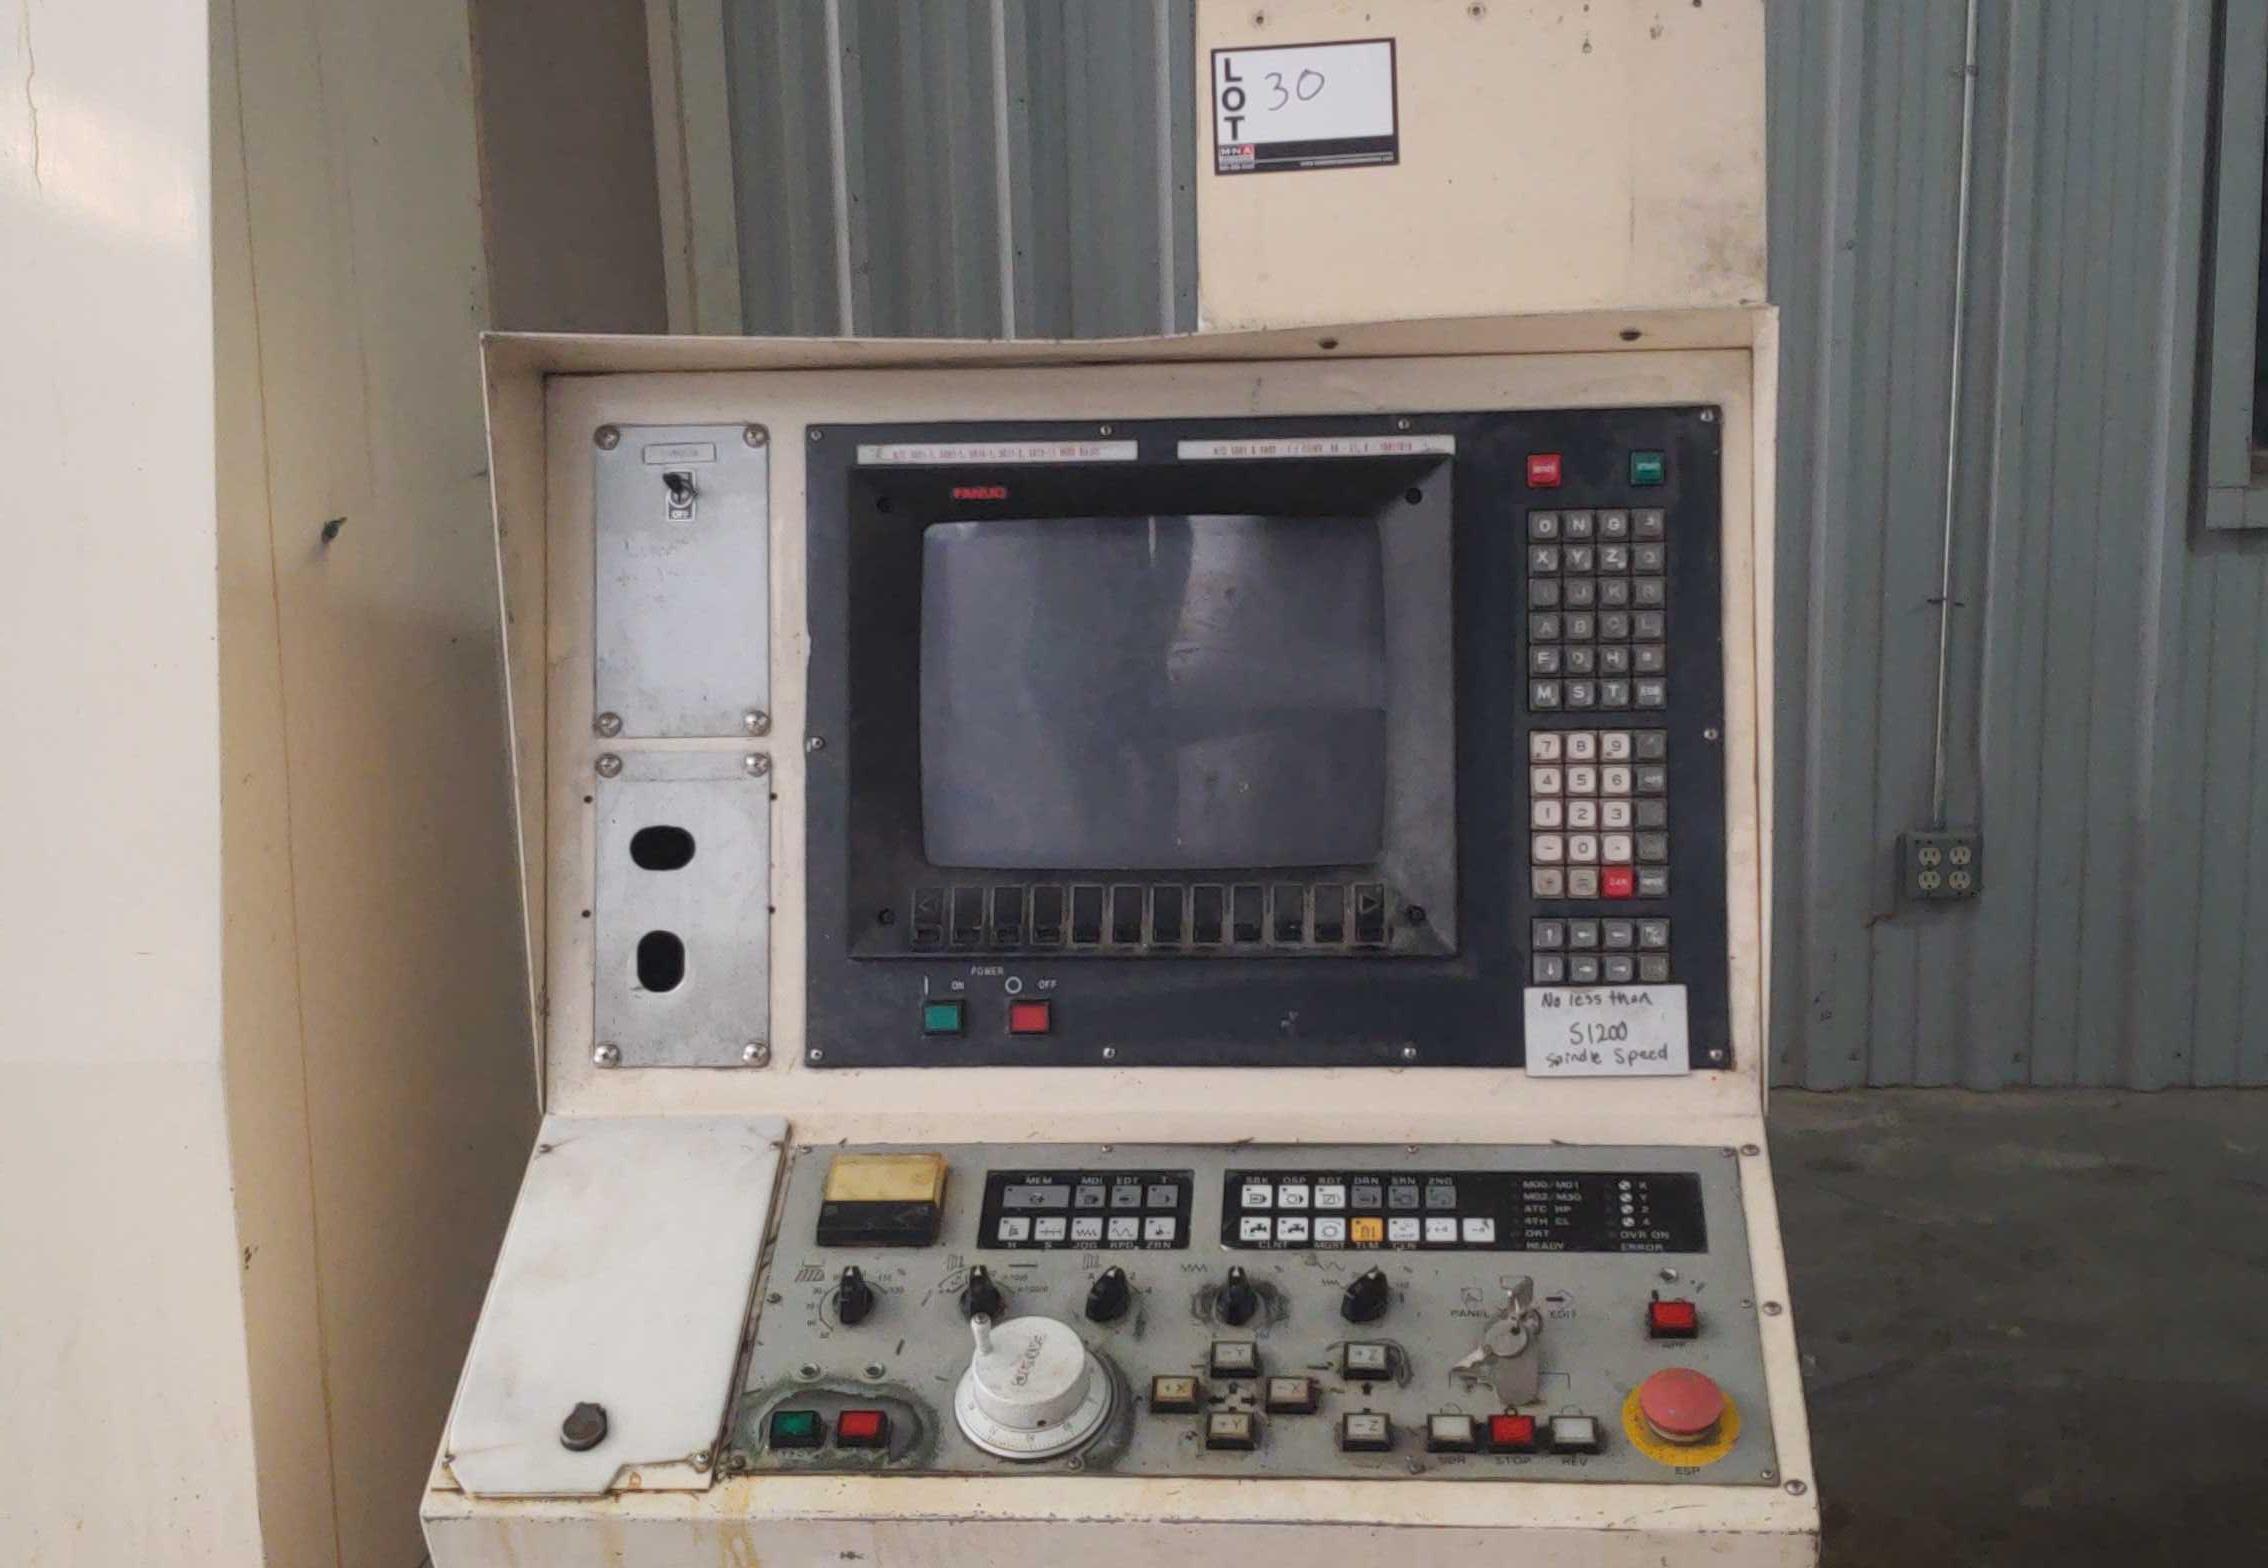 "Mori Seiki MV 40B CNC Mill, Fanuc 11M control w/ LCD screen CAT 40 spindle, 20 POS ATC, 31.5""x X - Image 5 of 6"